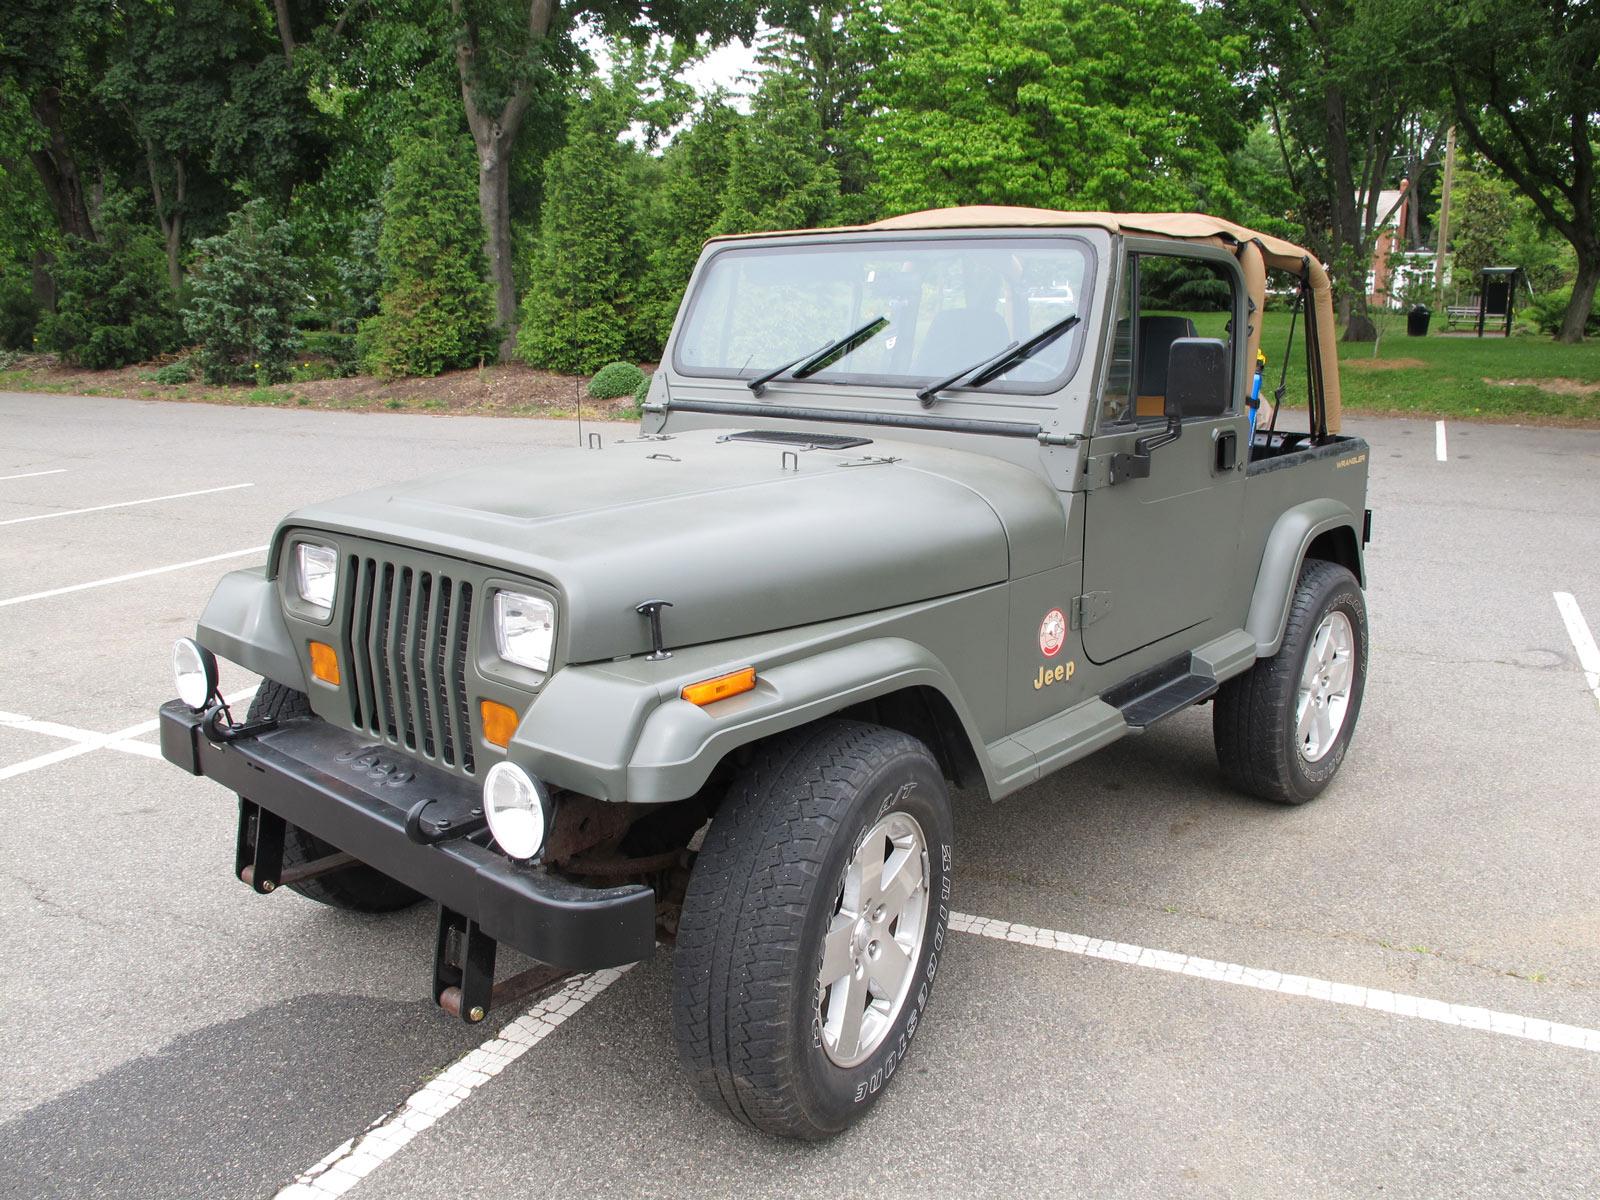 jeep-paint2a.jpg